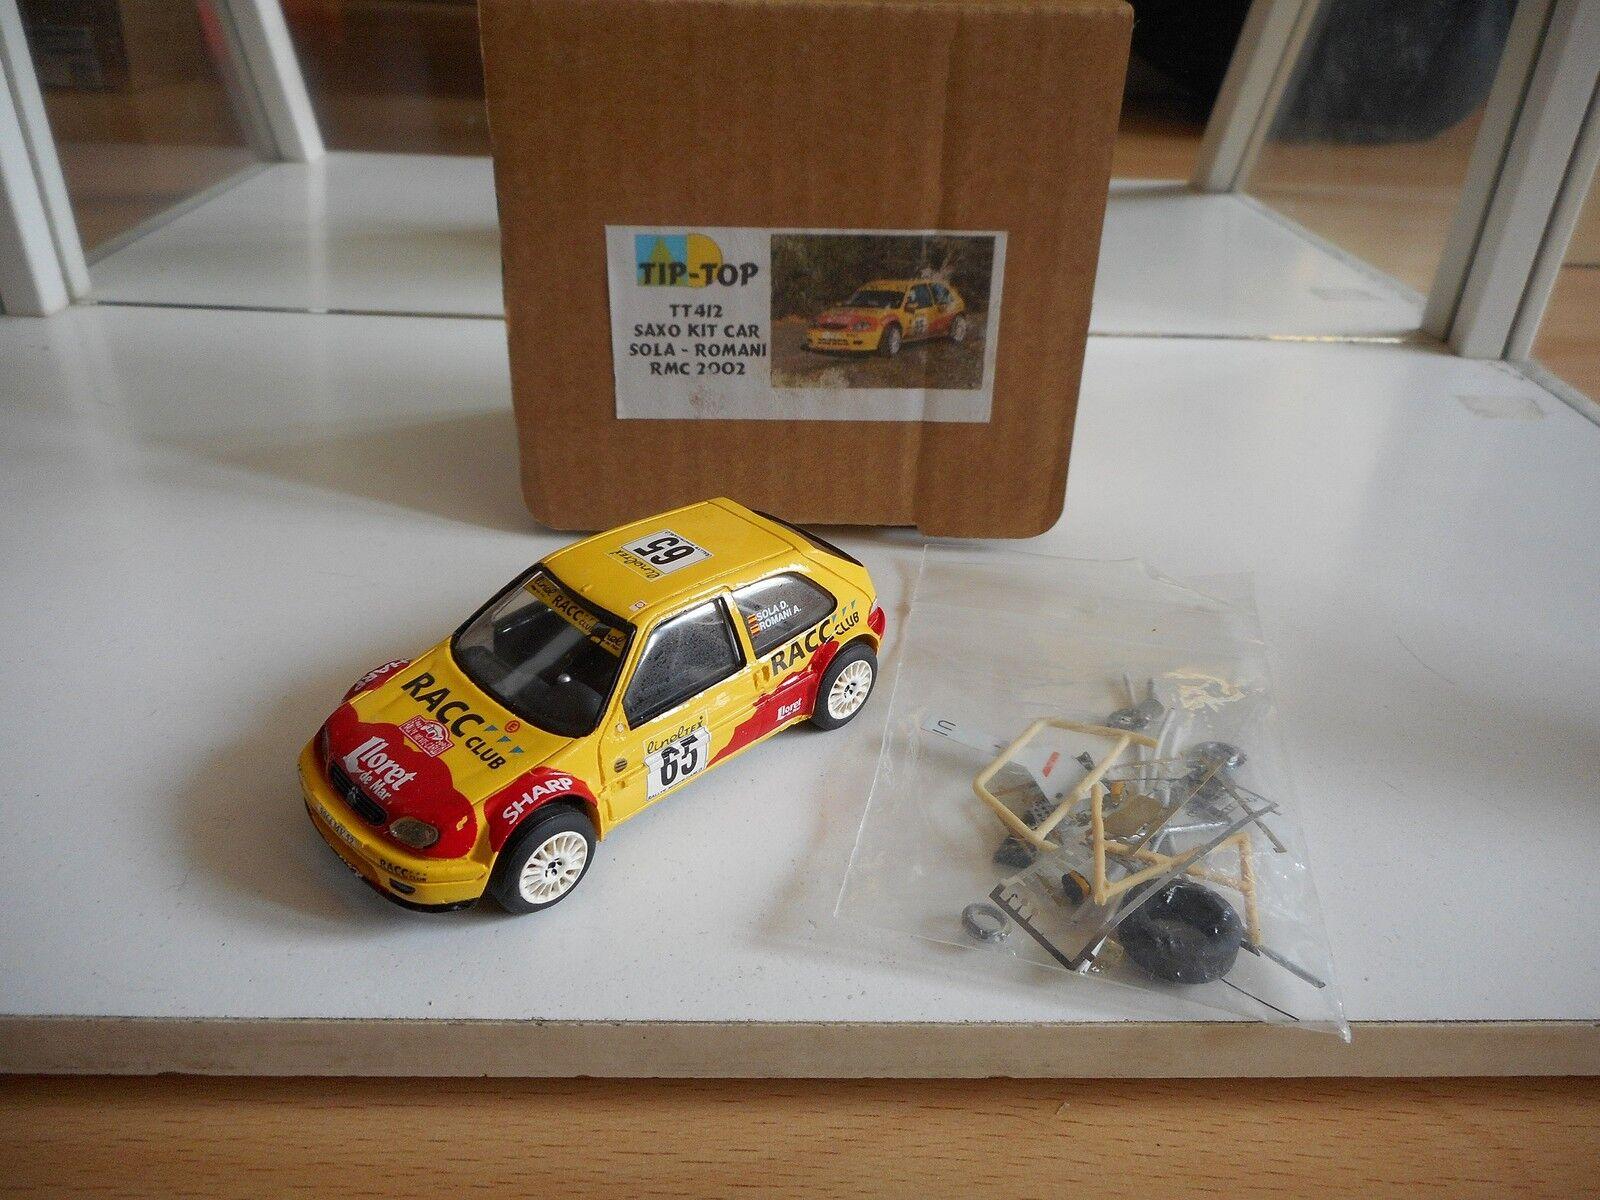 Tip Top Saxo Kit voiture Sola - Rohommei Rally  Monte voiturelo 2002 jaune on 1 43 in Box  Commandez maintenant